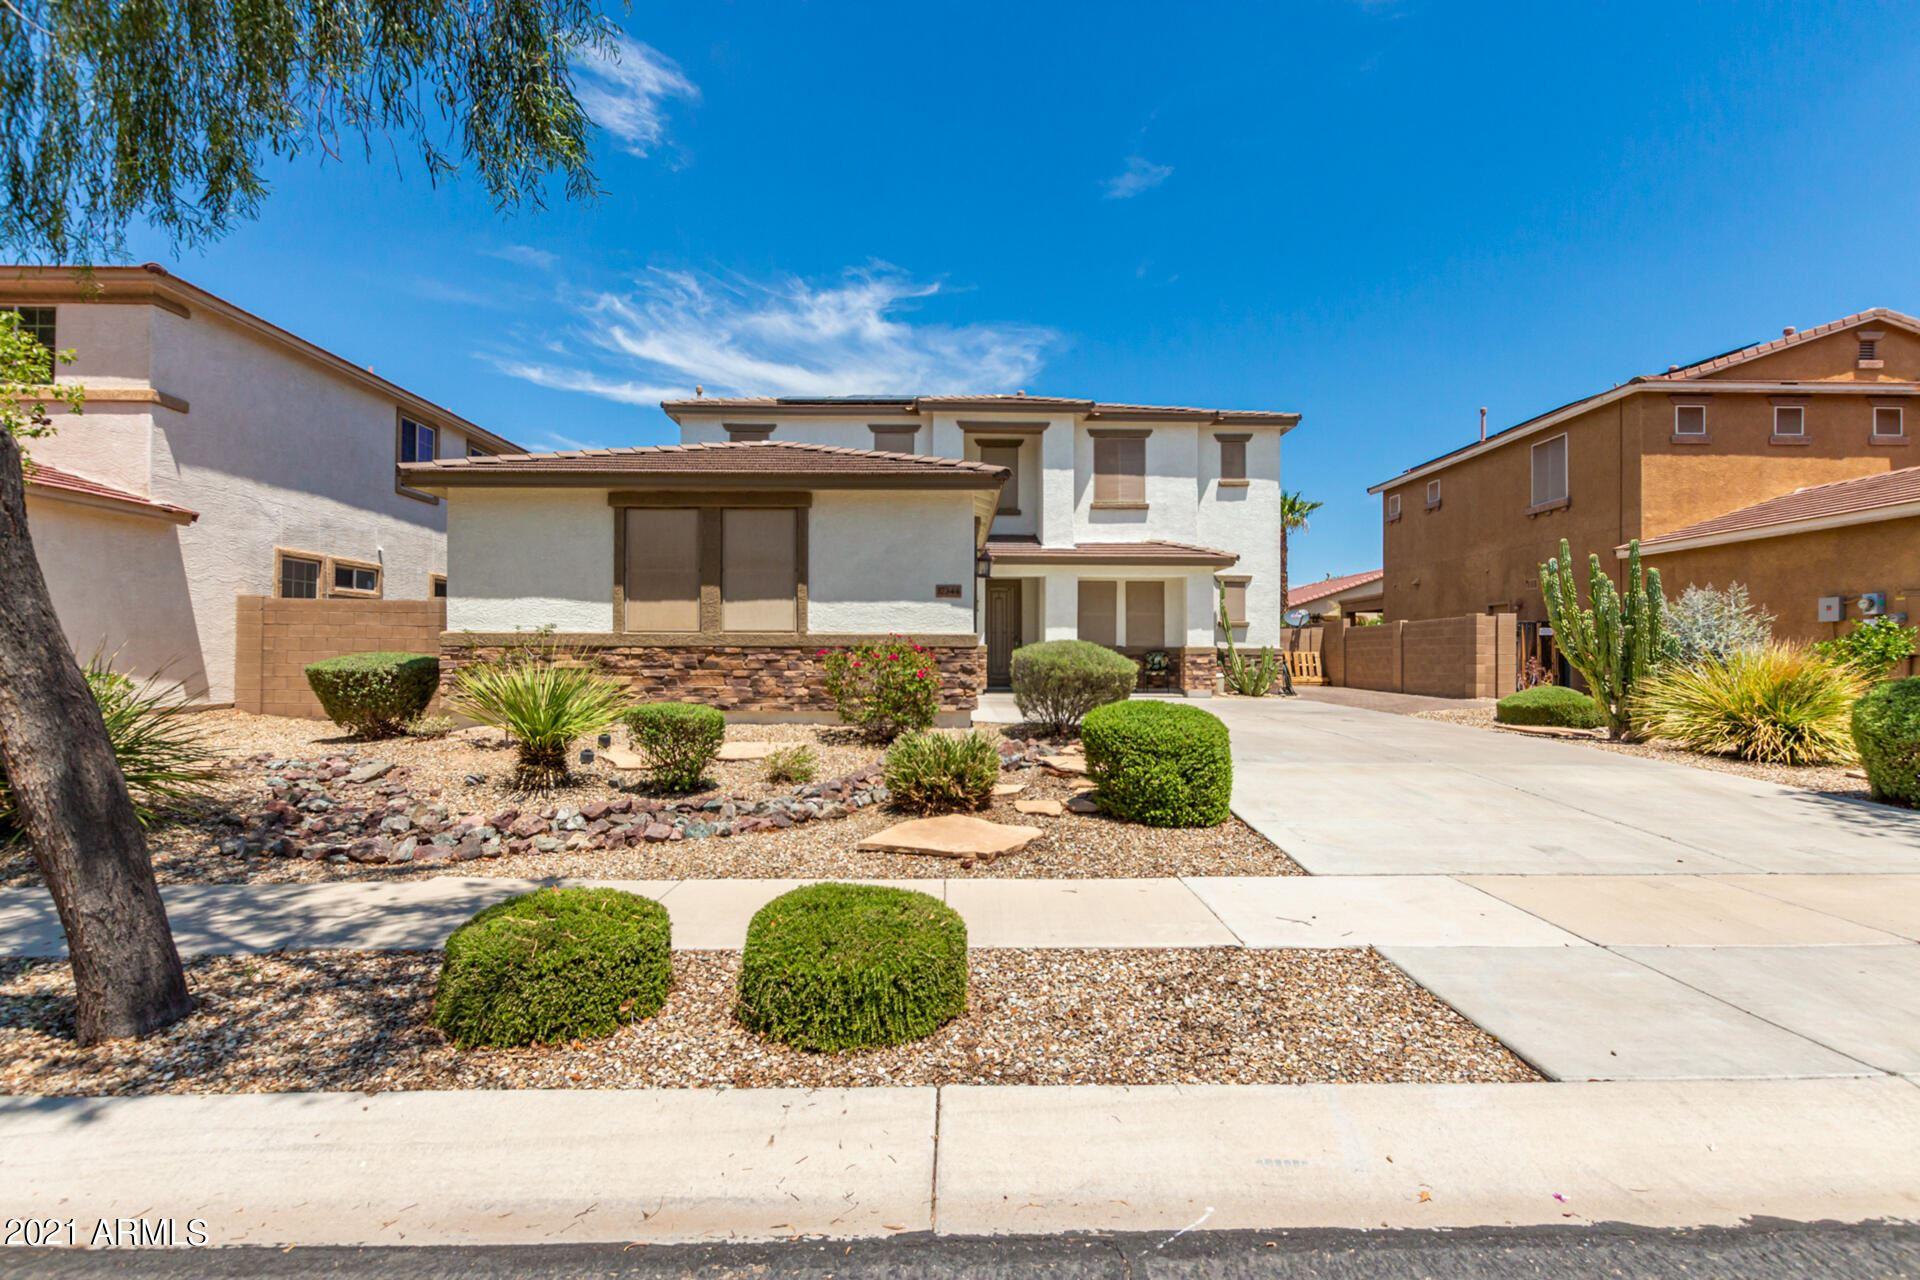 Photo of 17344 W RED BIRD Road, Surprise, AZ 85387 (MLS # 6269539)